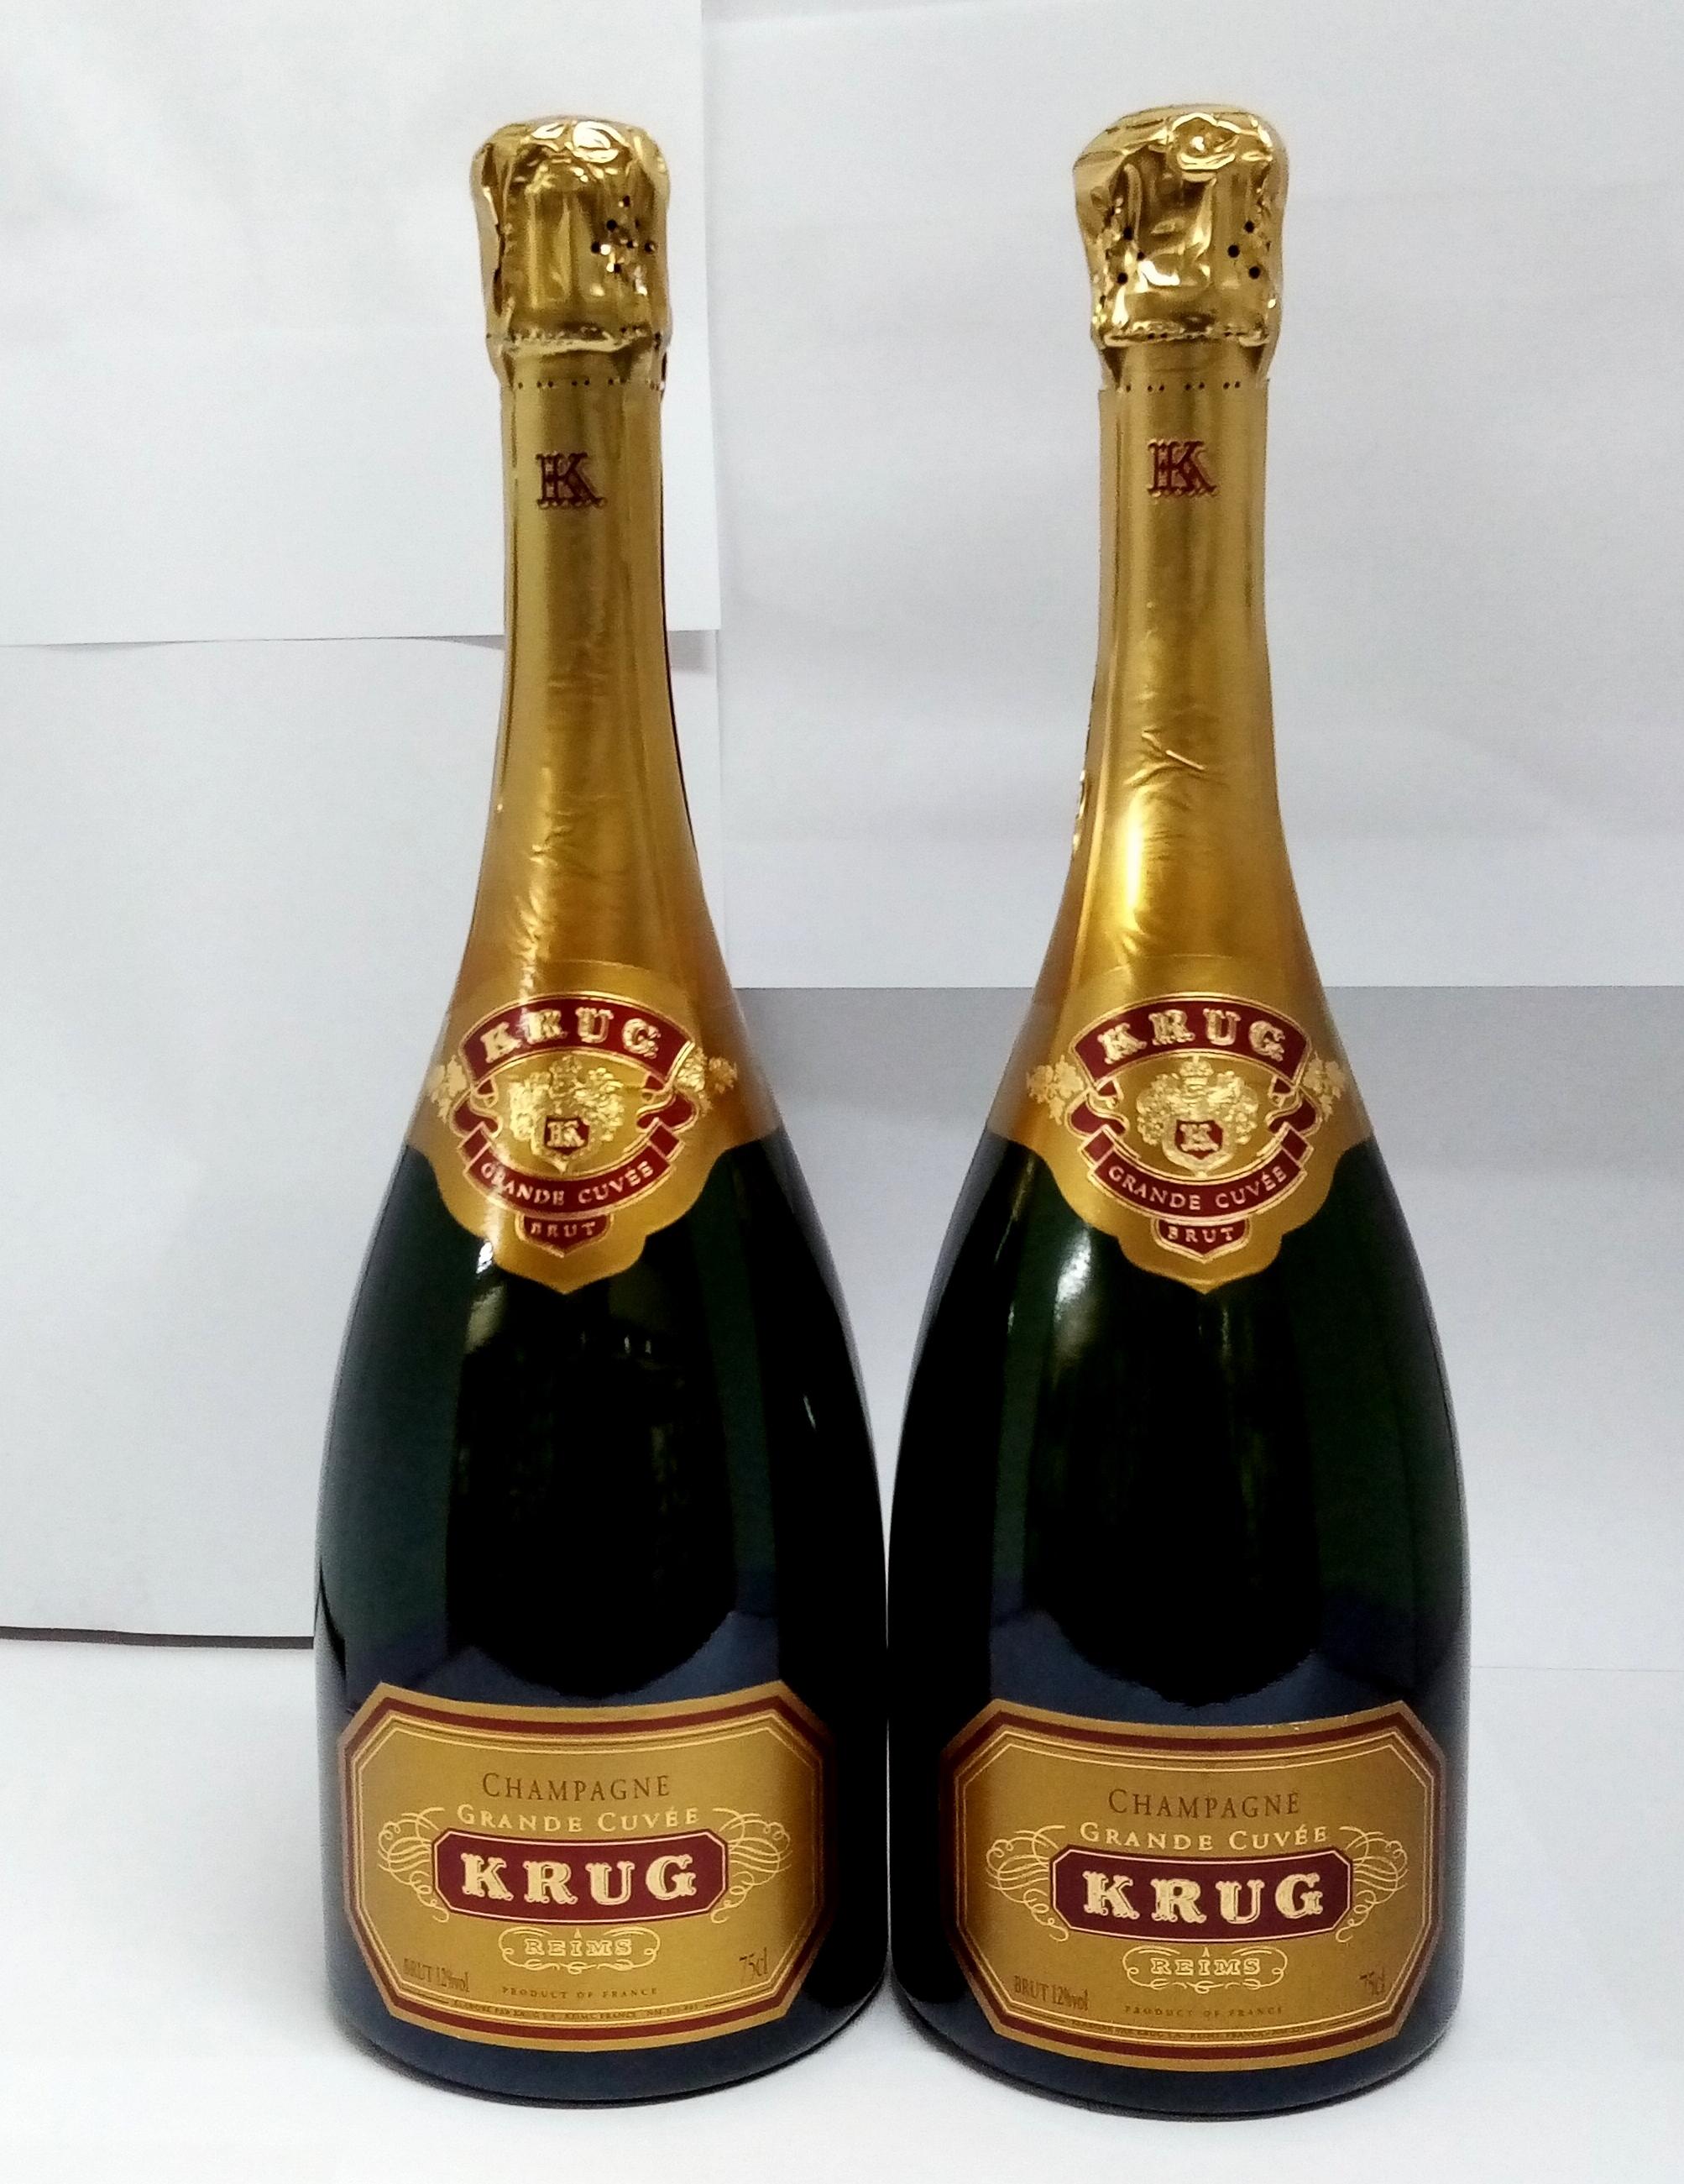 Lot 3 - 2000 Krug